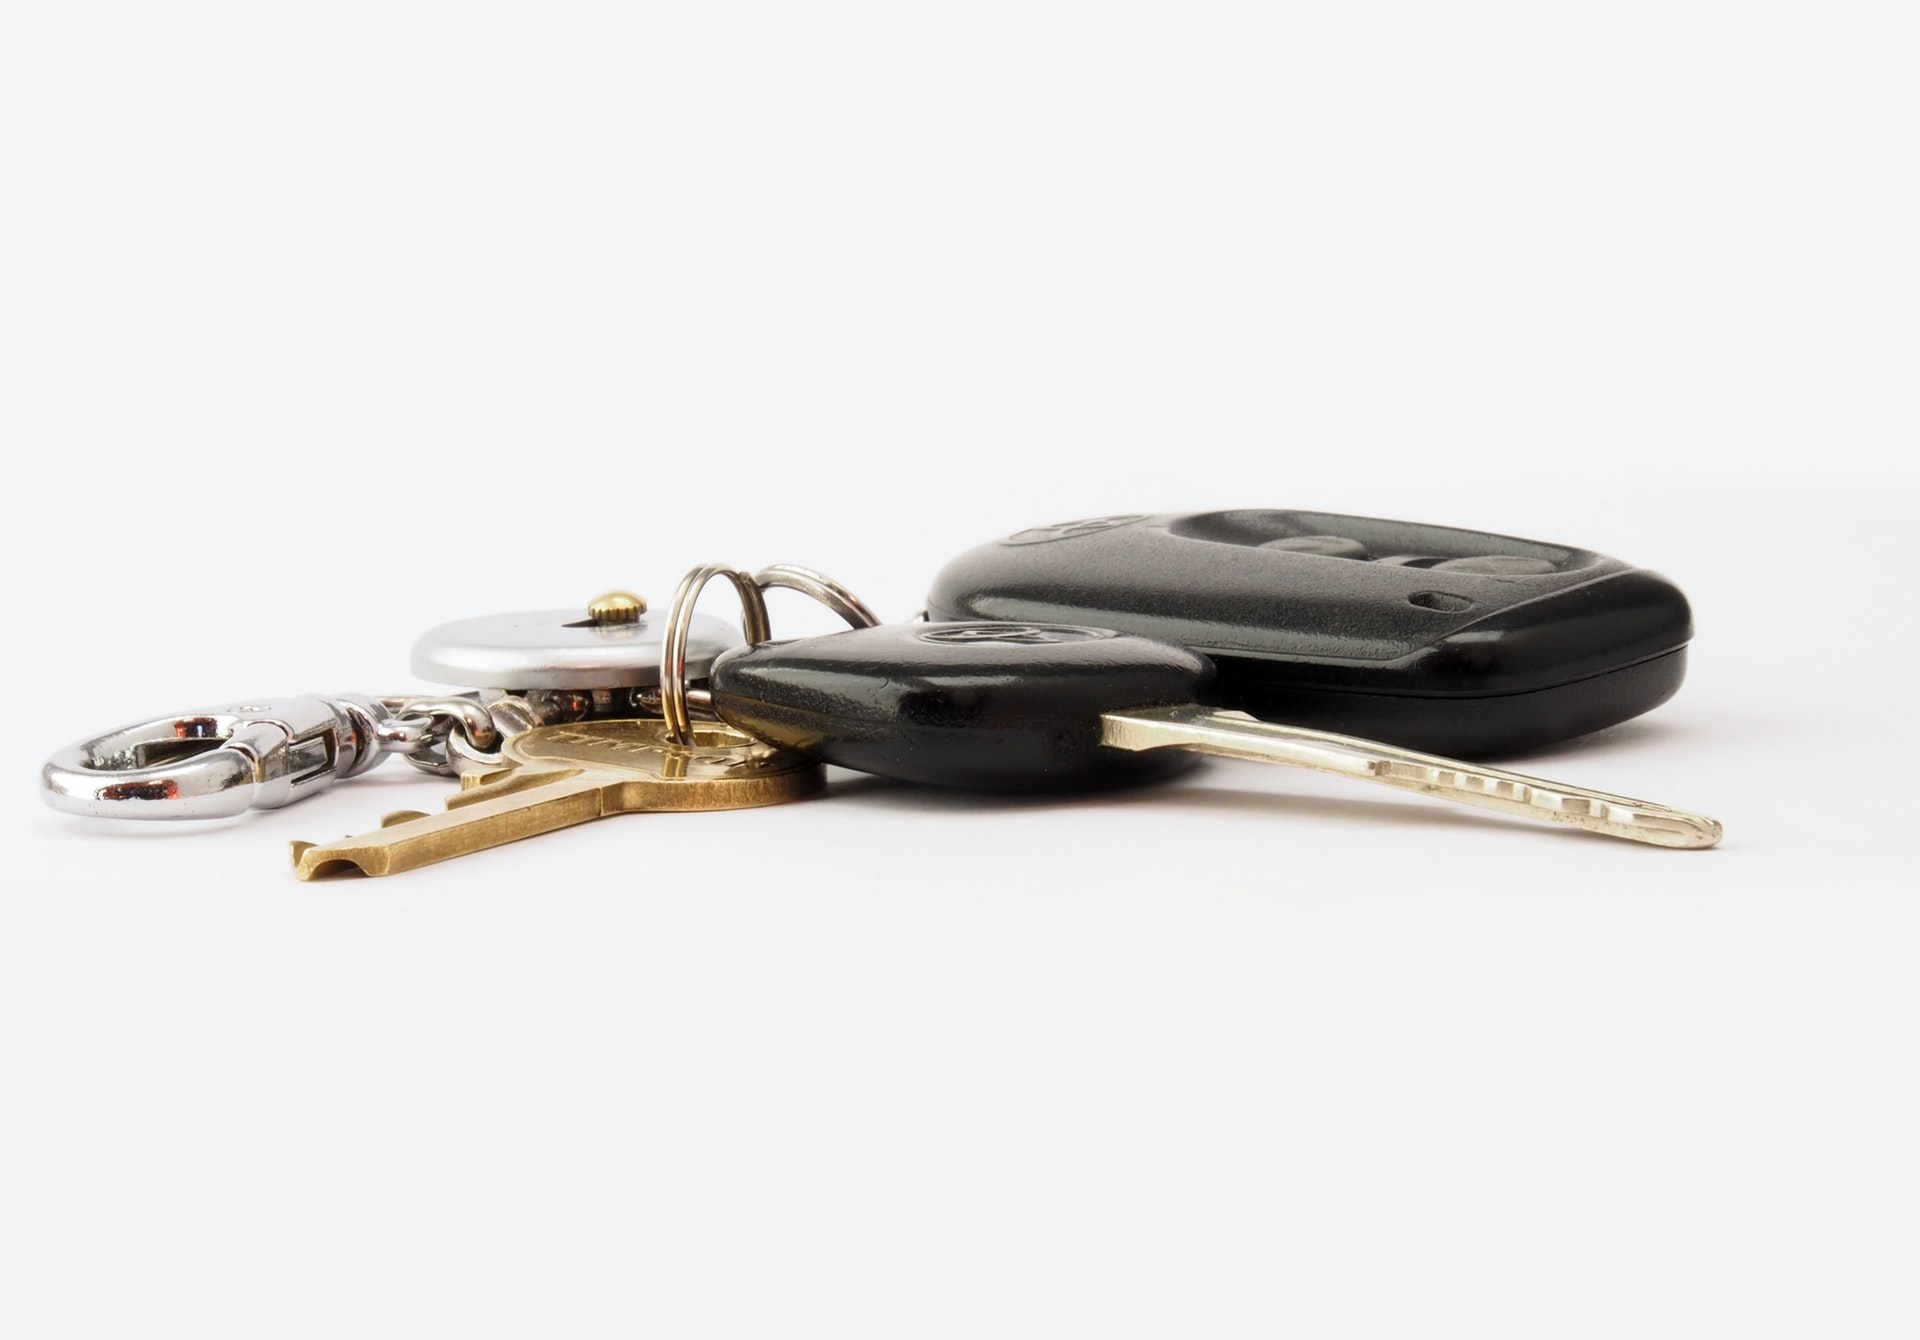 Previous owners car keys